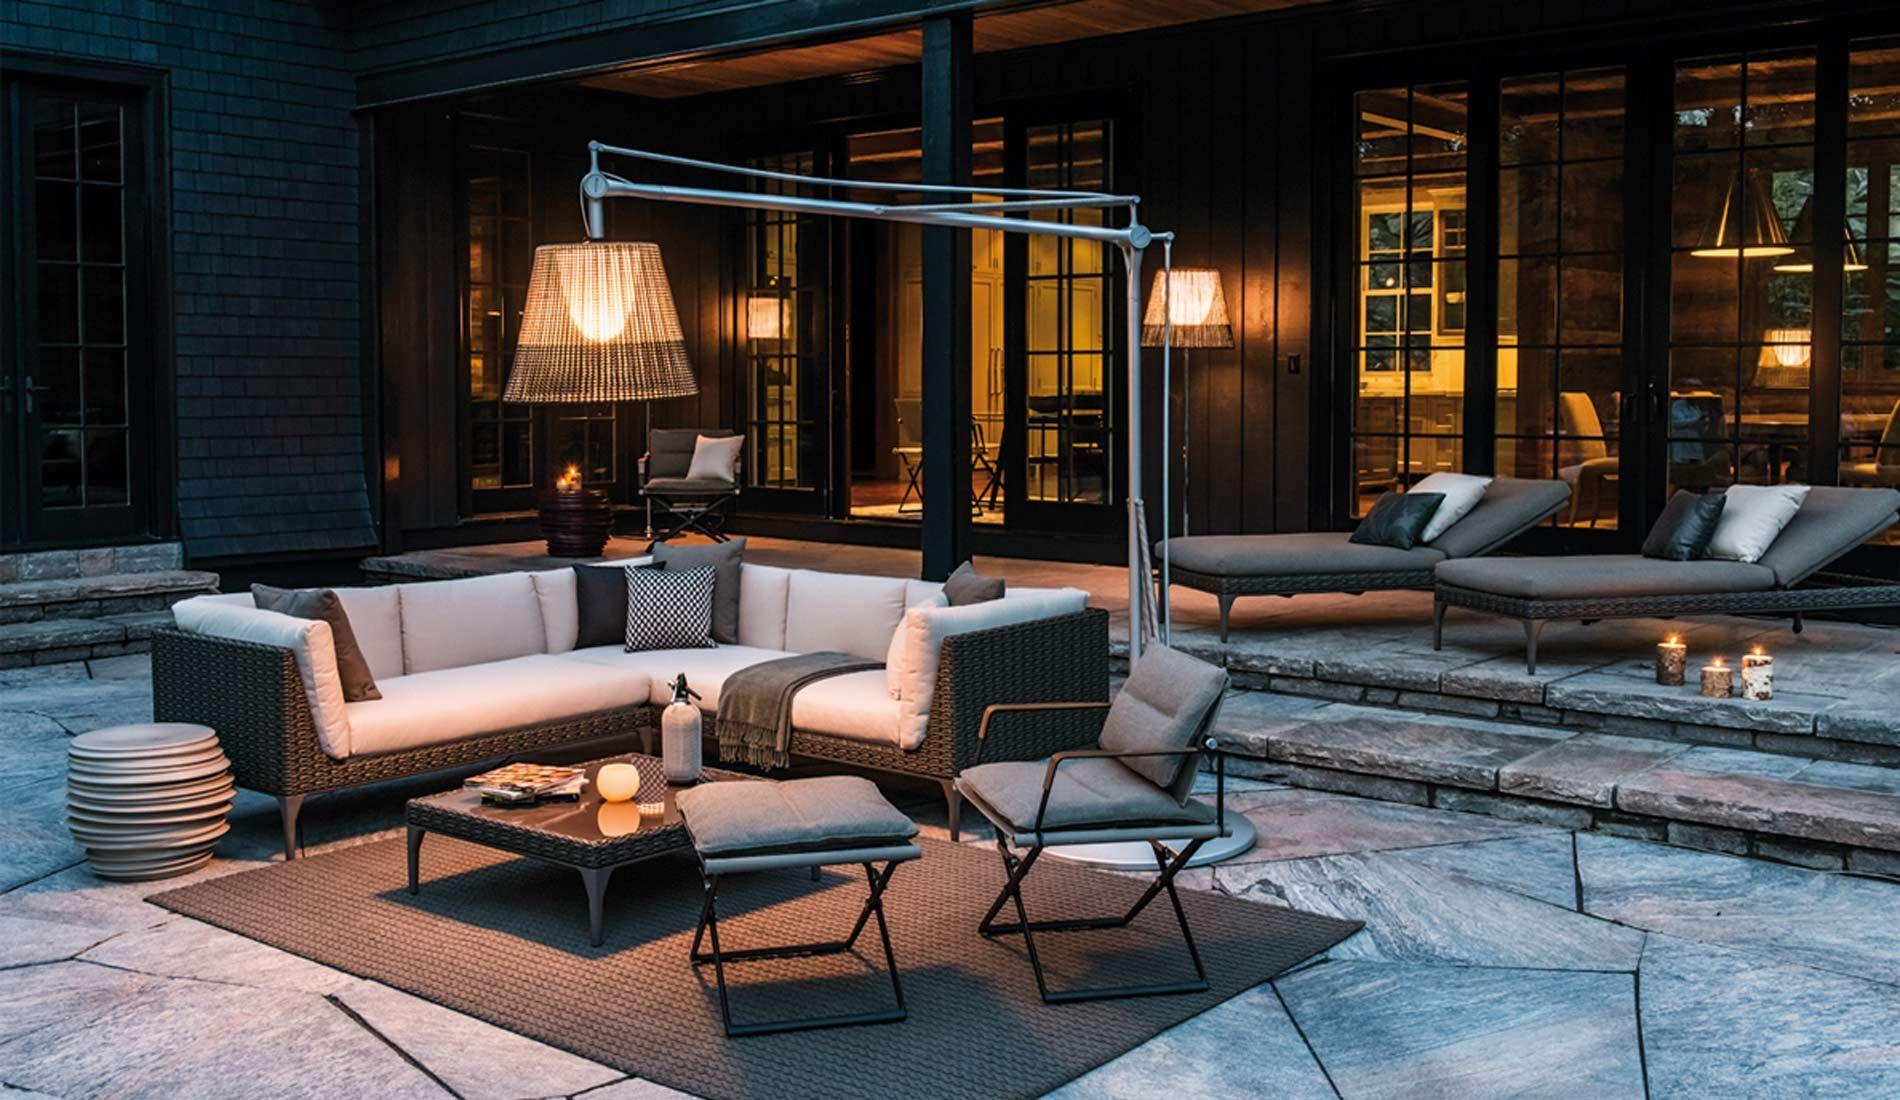 Dedon mu sofa coffee table beach loungers seax for Dedon muebles